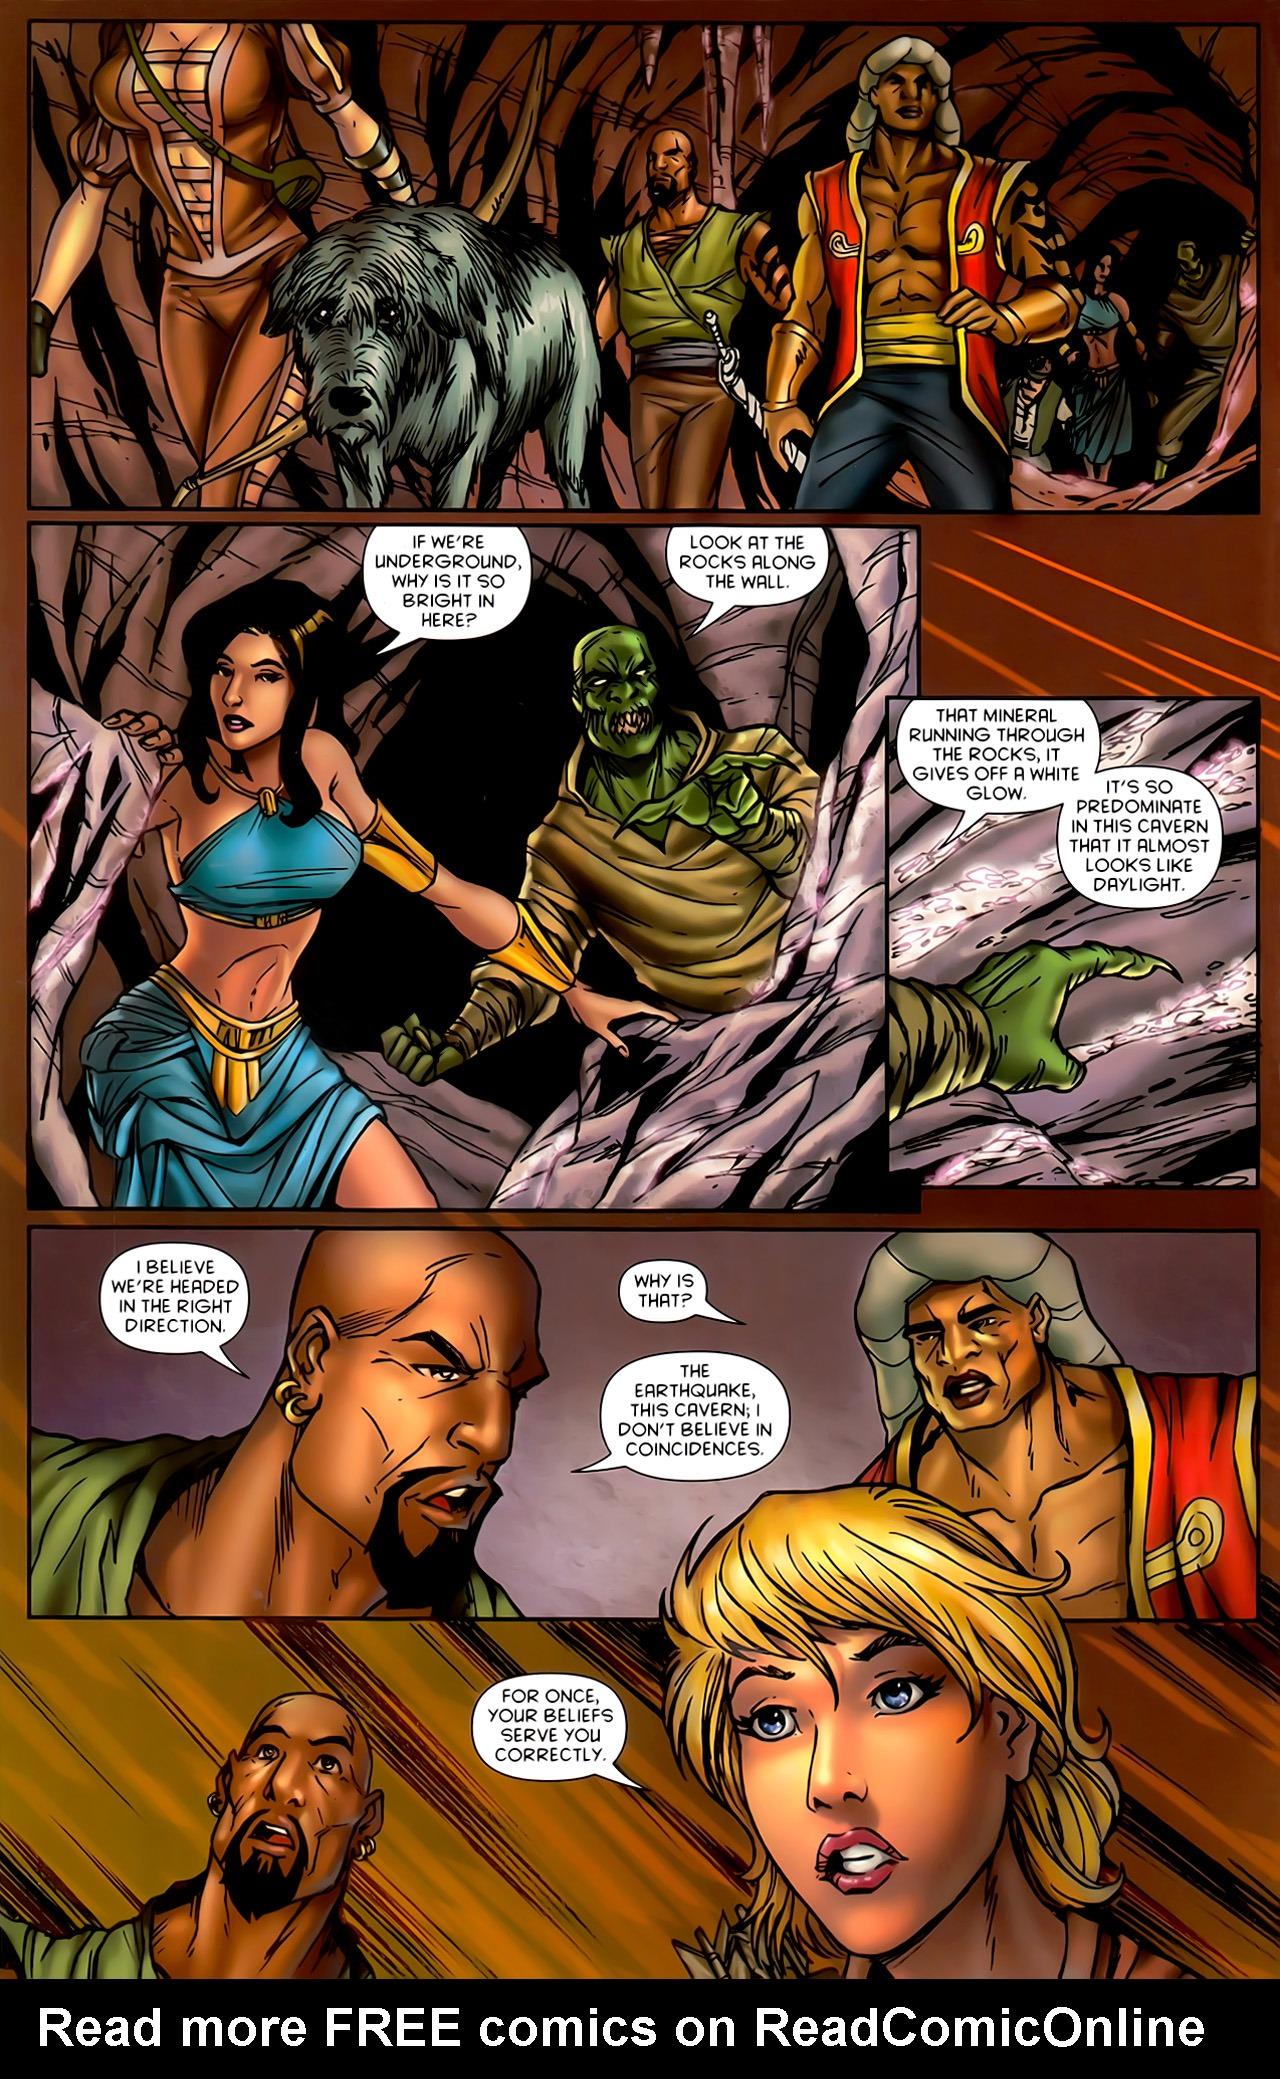 Read online 1001 Arabian Nights: The Adventures of Sinbad comic -  Issue #10 - 8